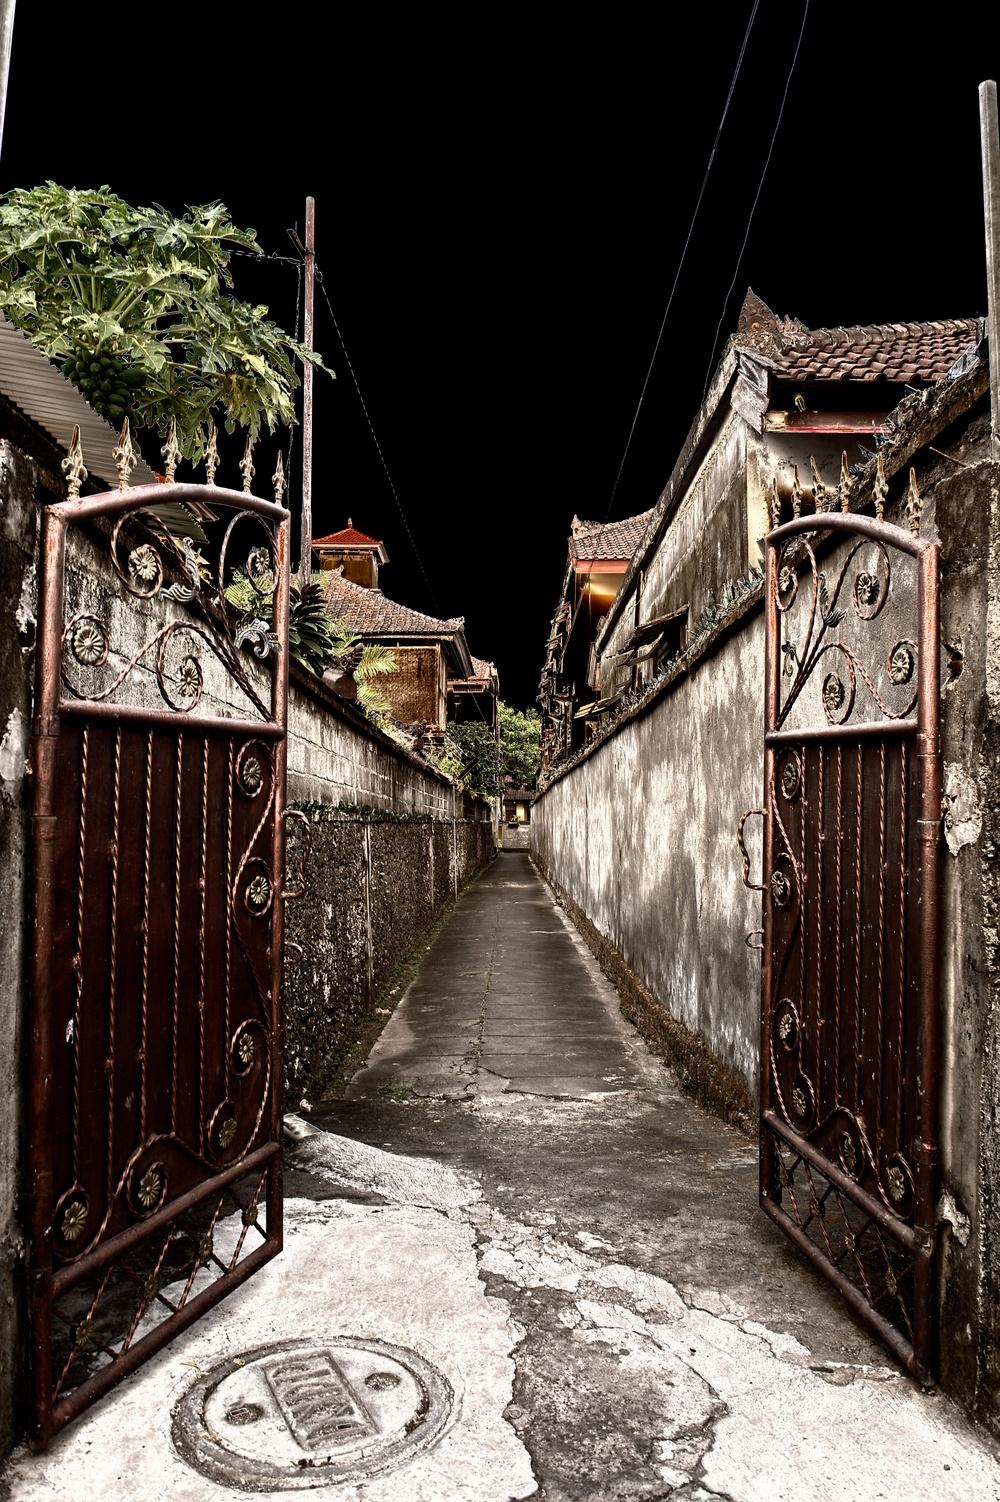 Small alley in Kuta around sunset